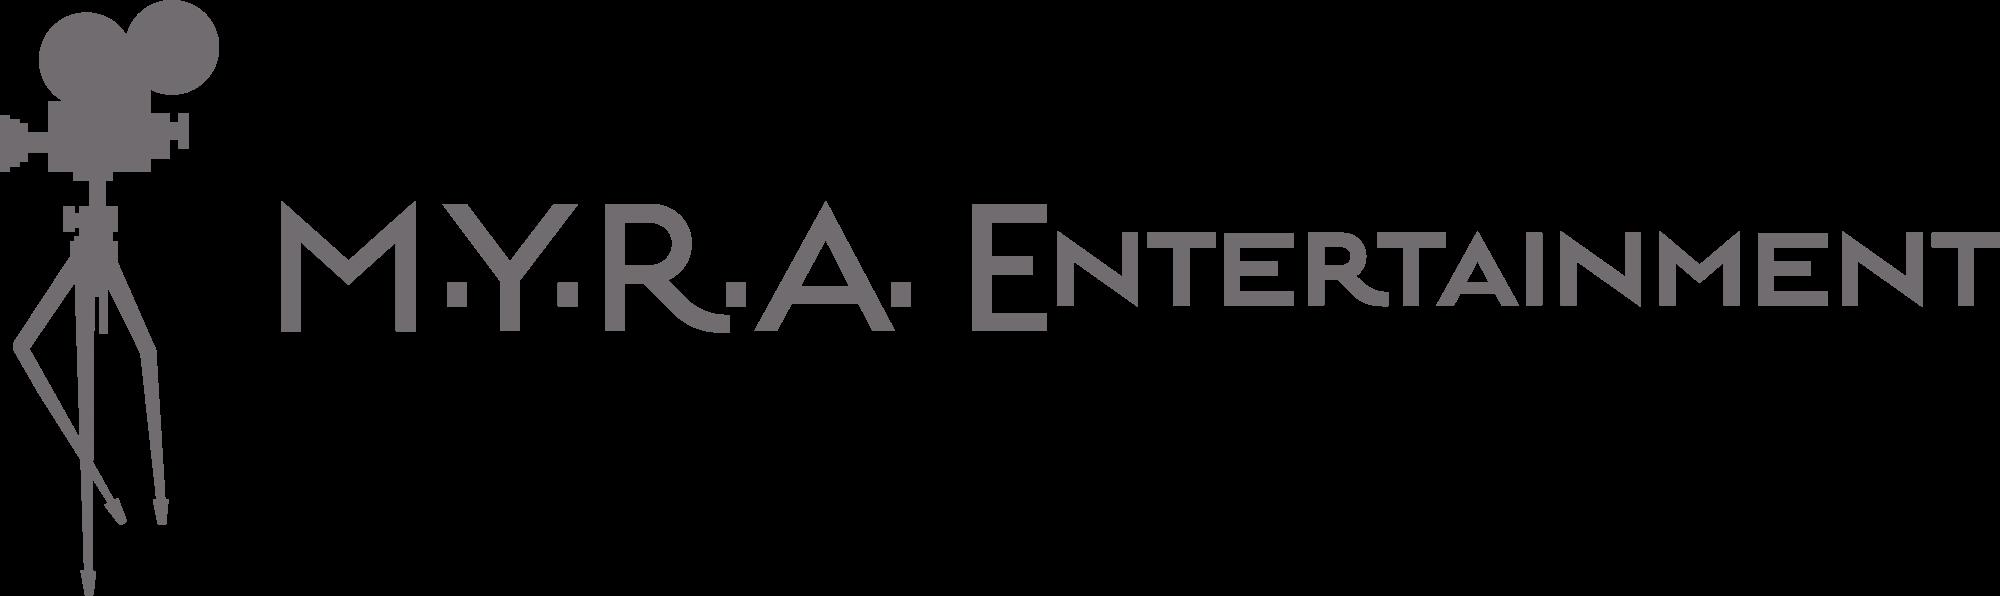 M.Y.R.A. Entertainment